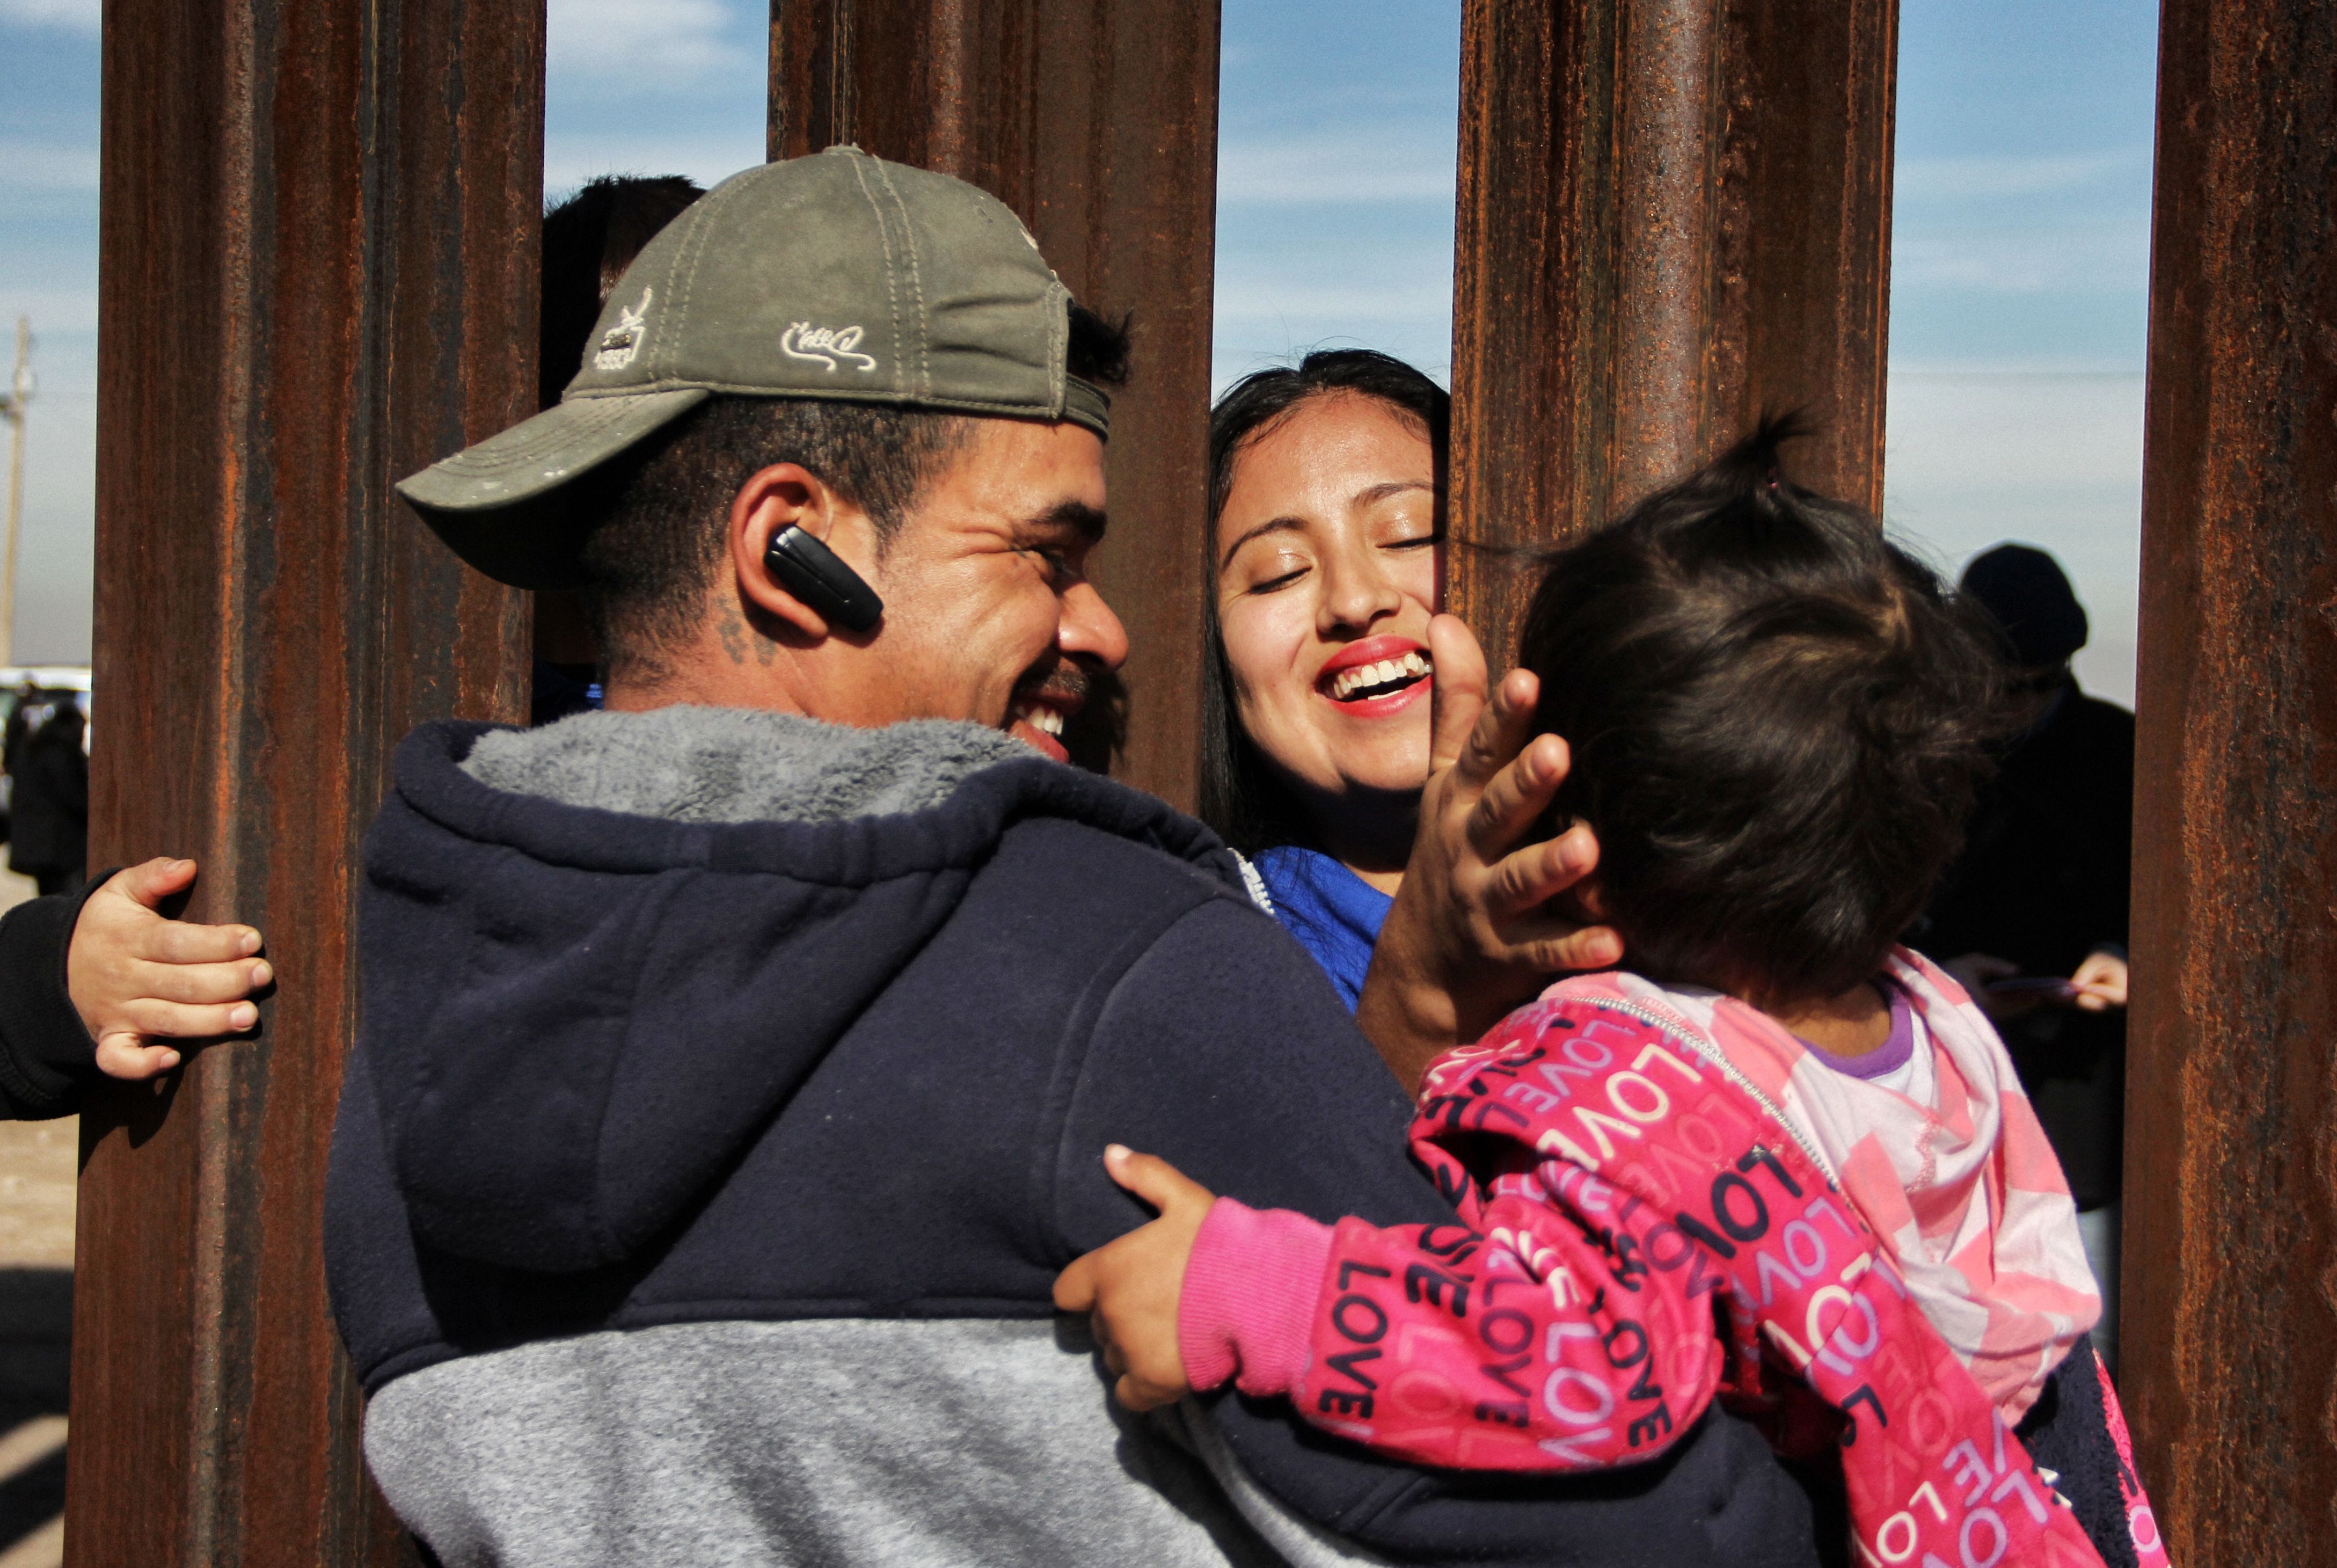 A family reunites at the border wall along El Paso, Texas, and Juarez, Mexico.